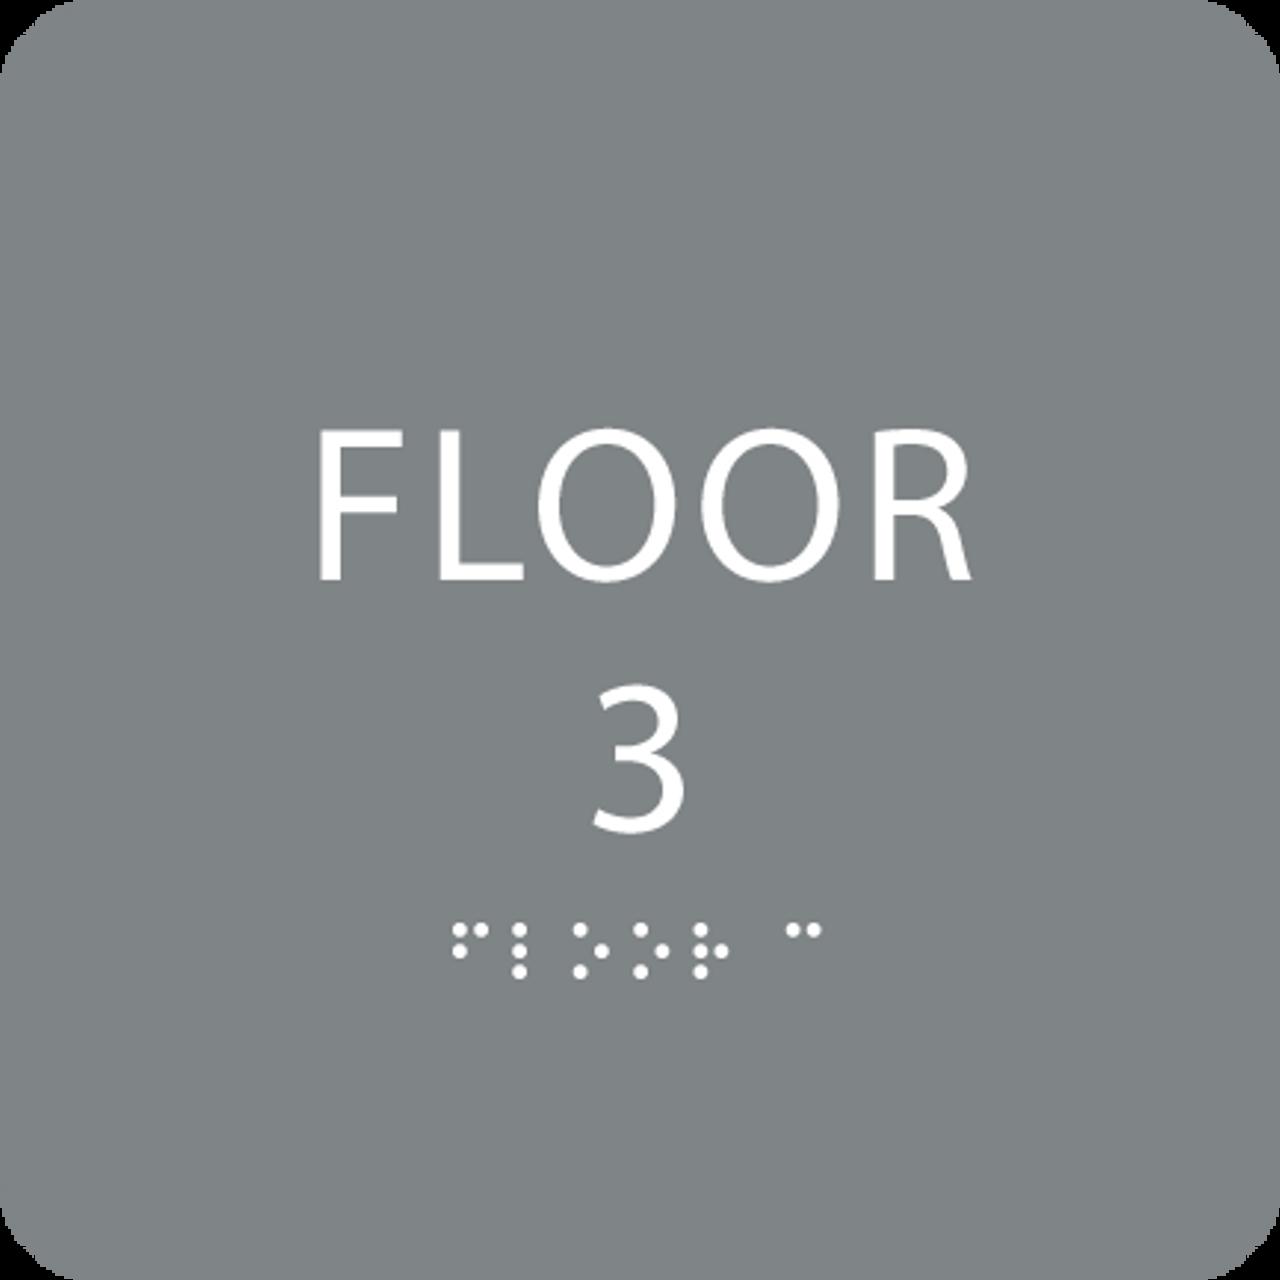 Grey Floor 3 Identification Sign